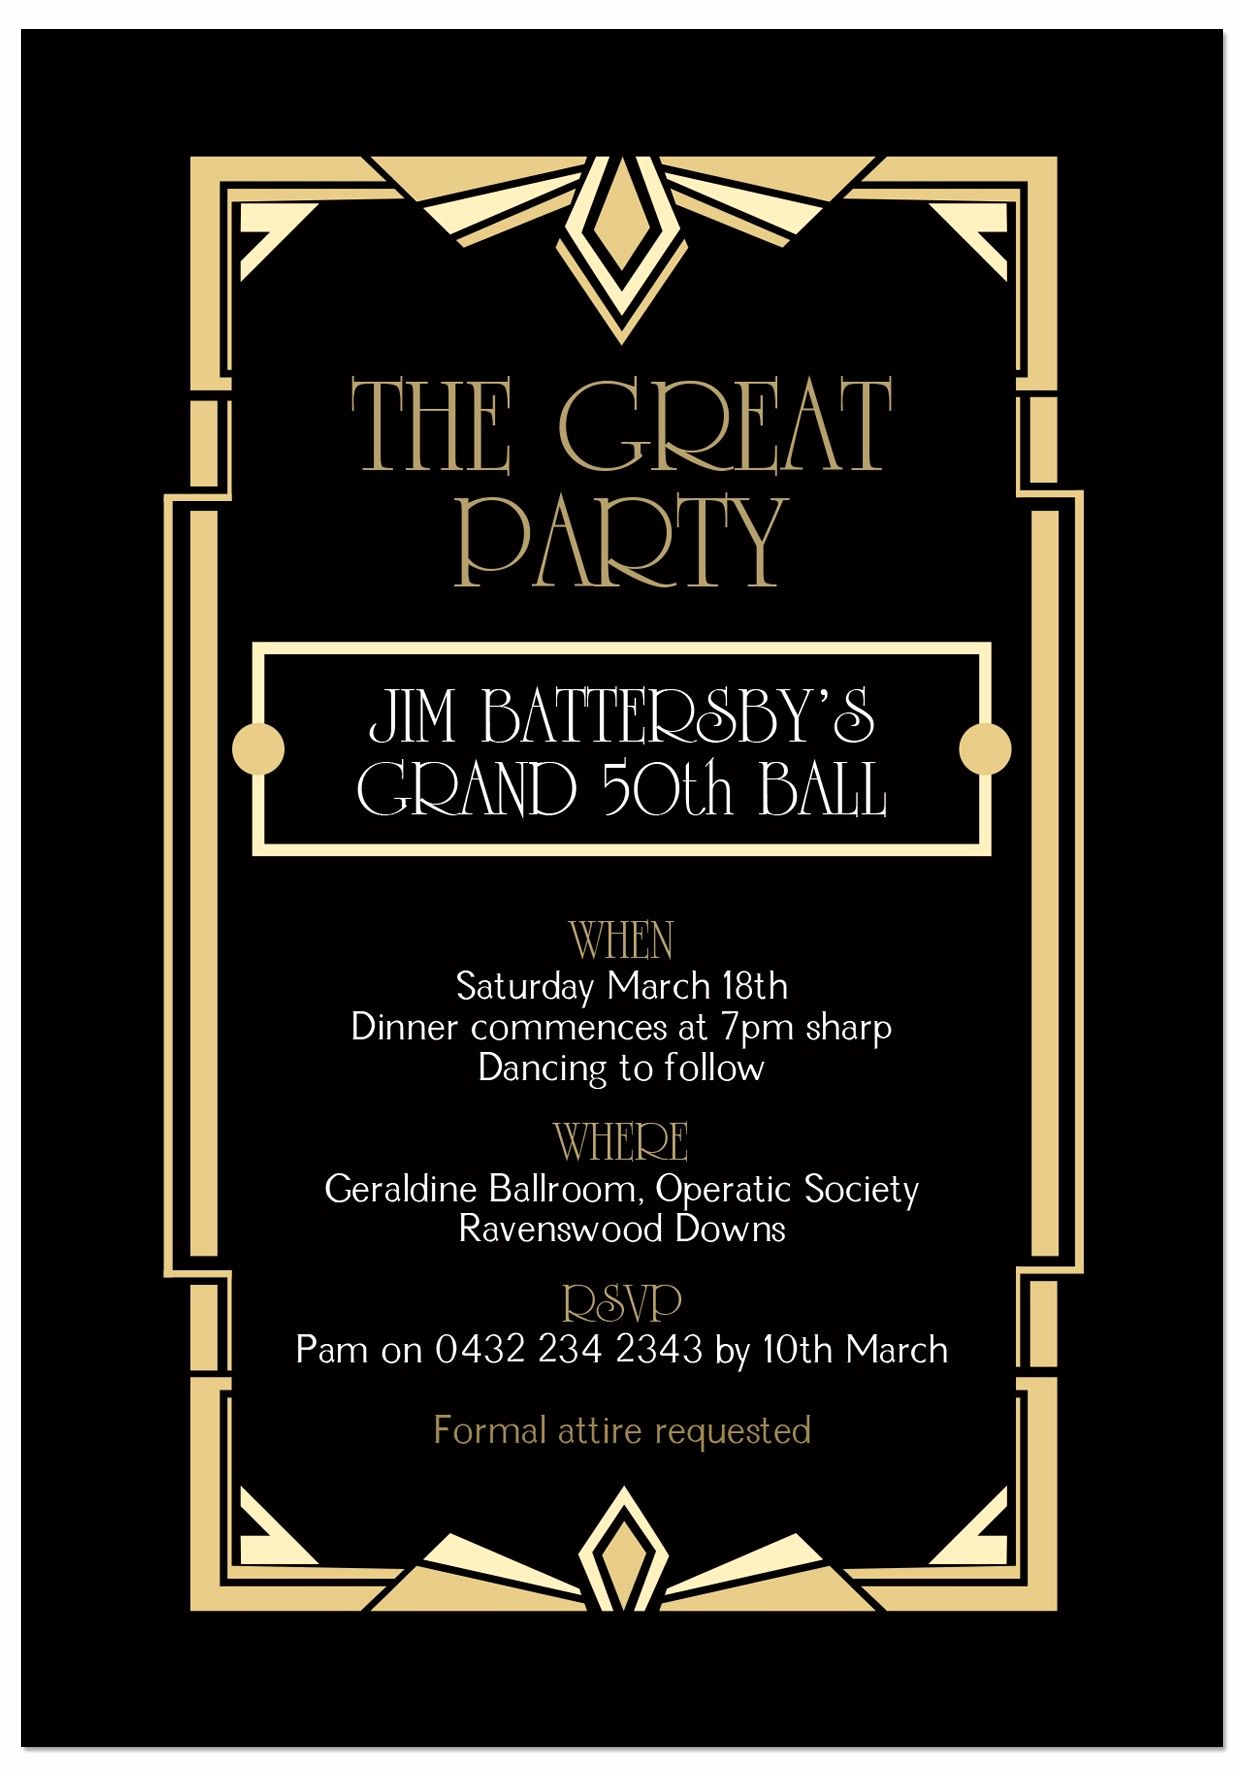 The Great Gatsby Invitation Lovely Gatsby Ball Birthday Invitations